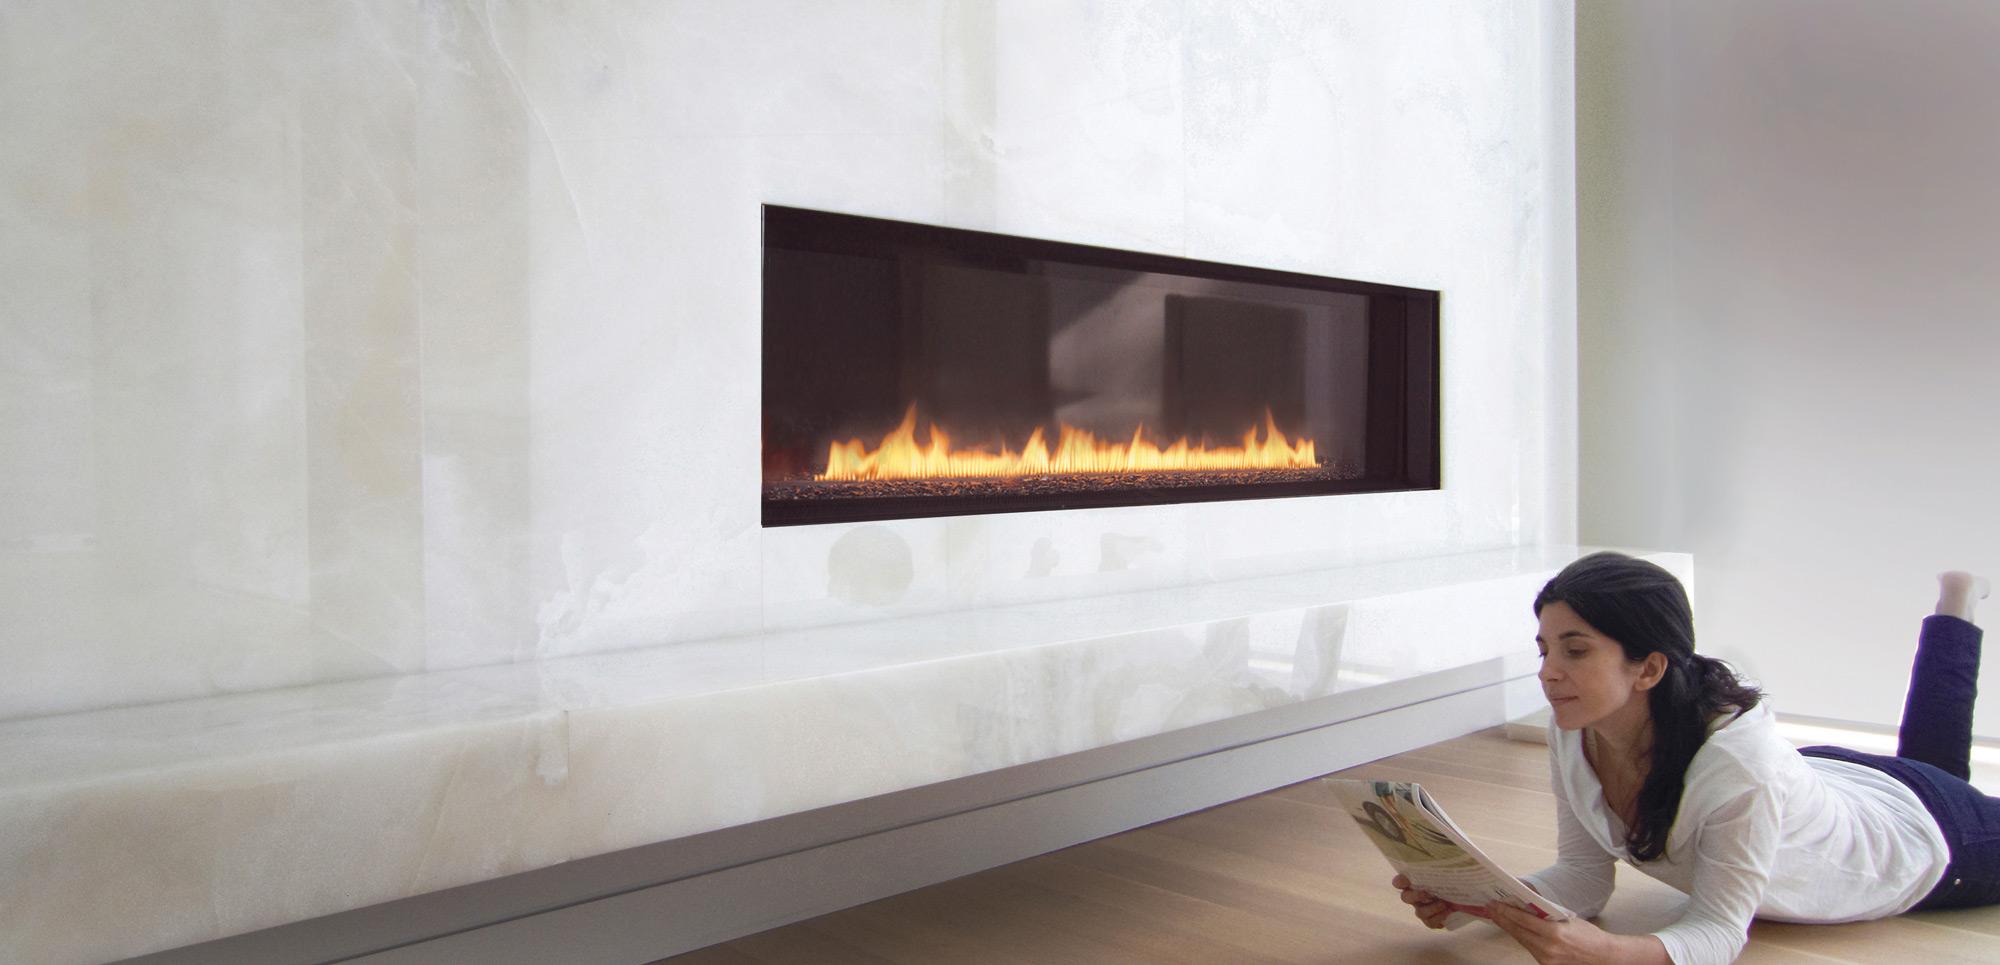 07 07 2015 18 06 2015 Fire Ribbon Direct Vent Single Vu 6ftC Homepage Carousel 6